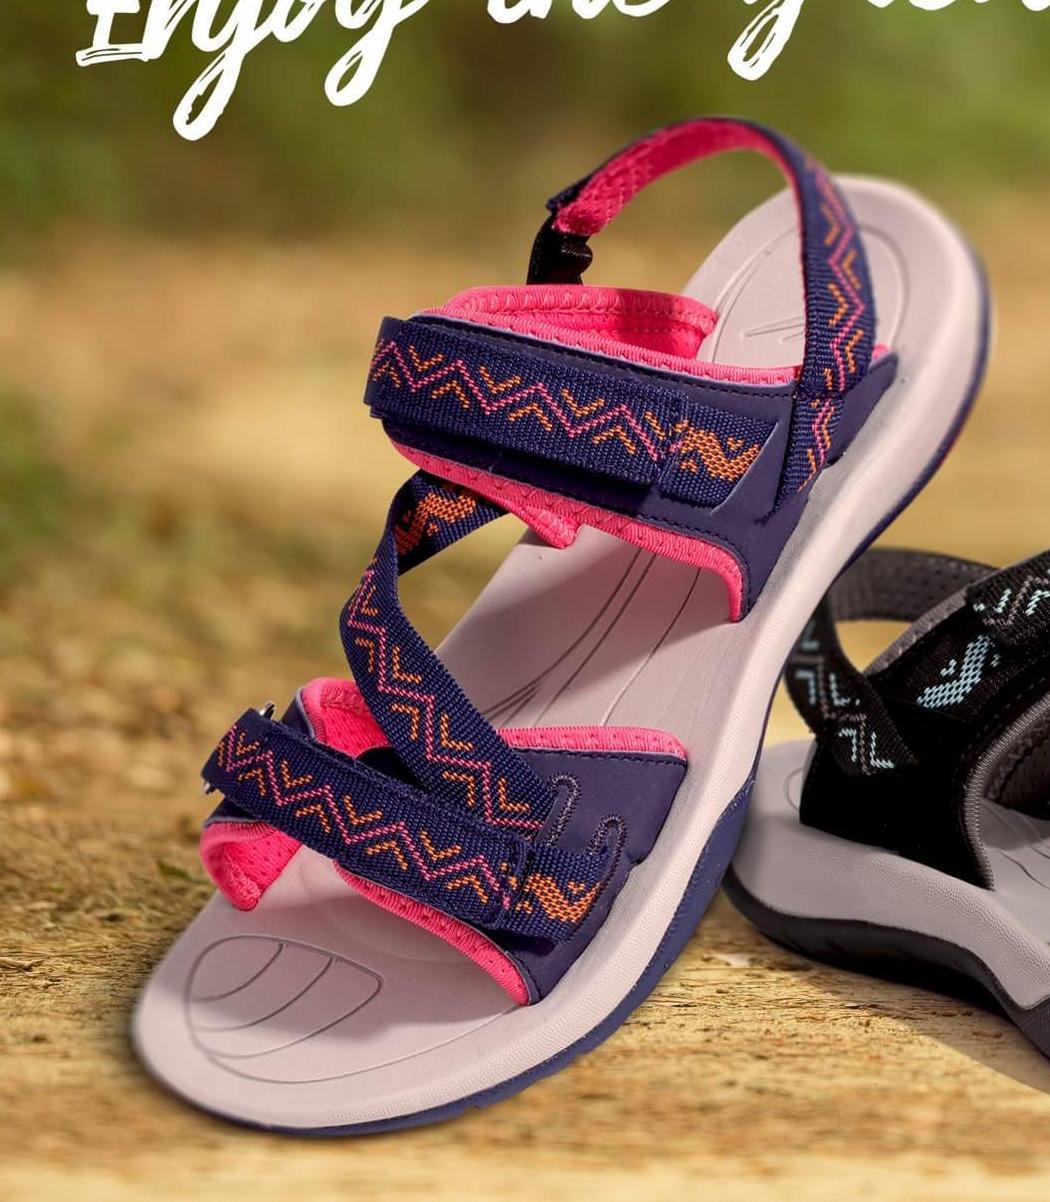 sandals world balance